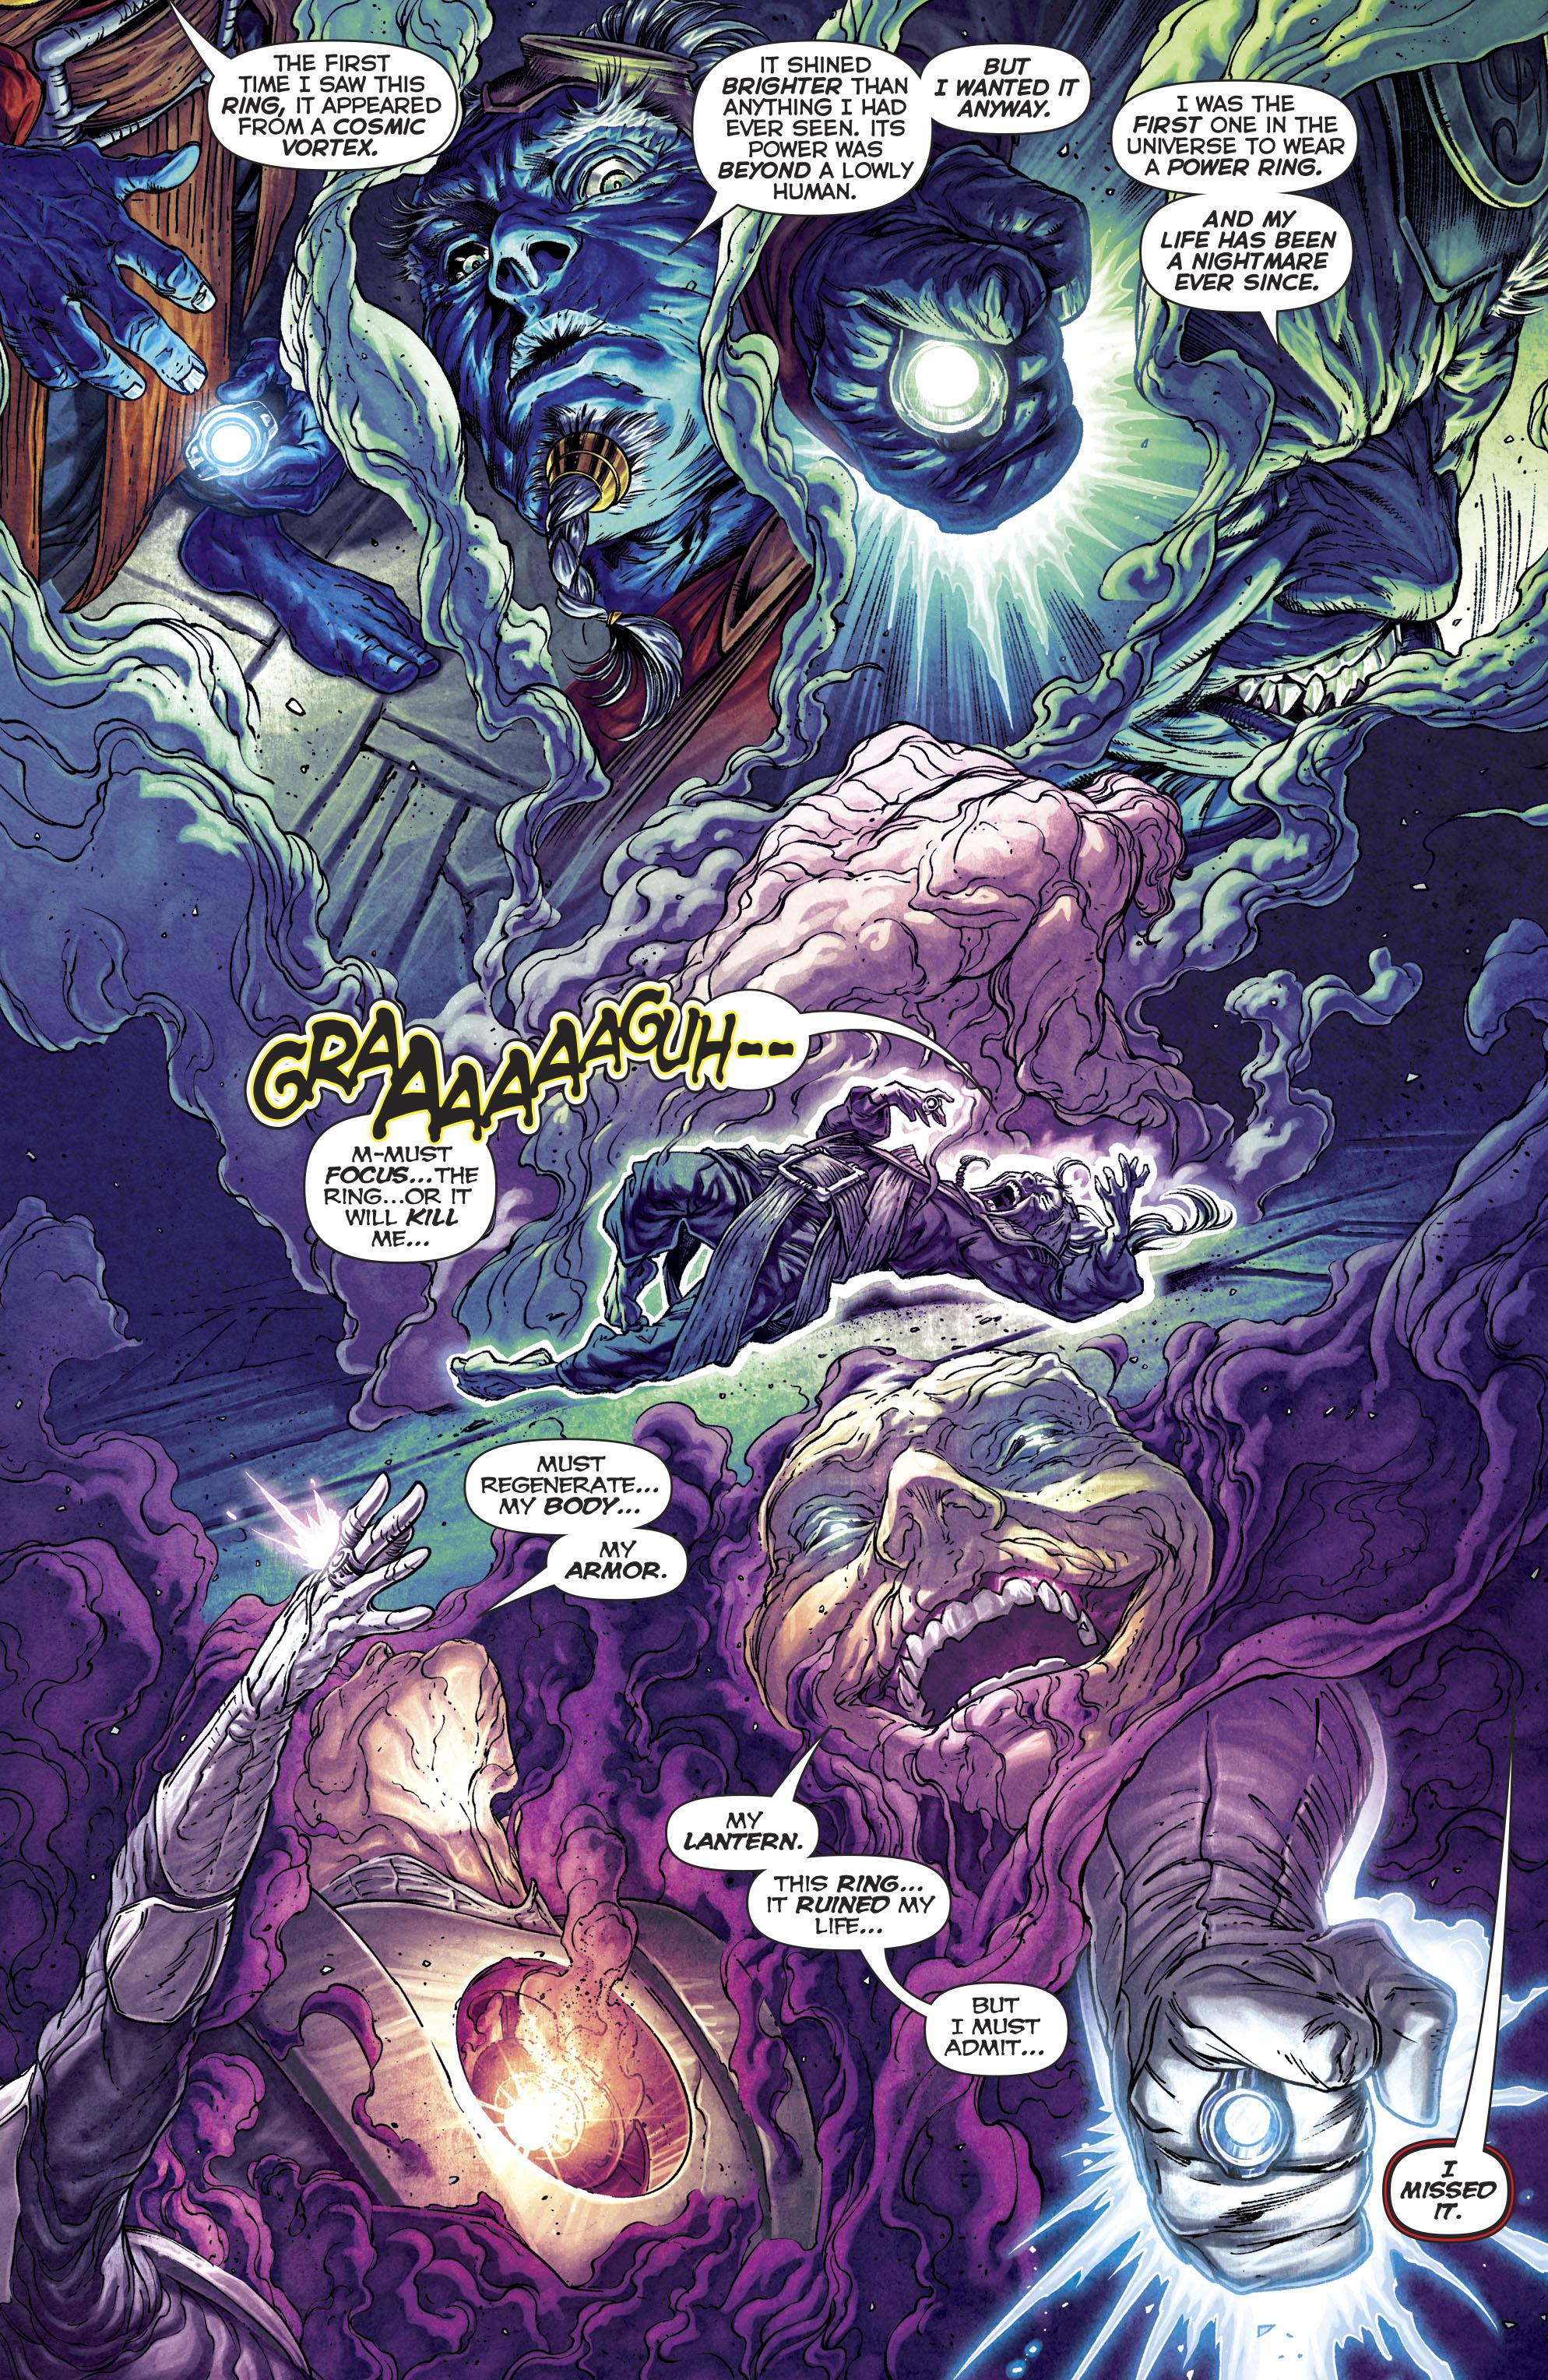 Read online Green Lanterns comic -  Issue #25 - 16